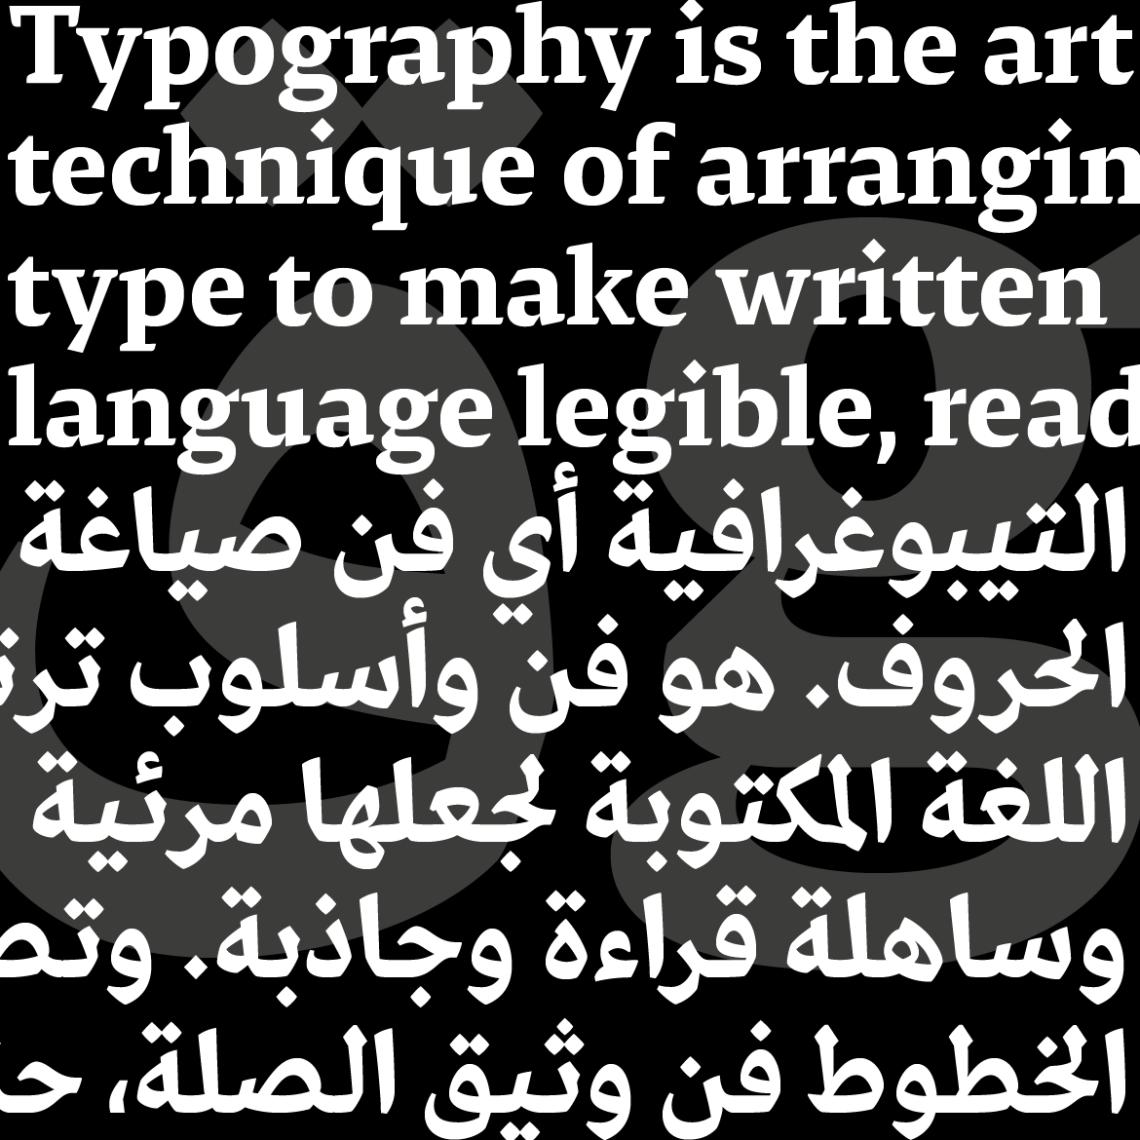 29LT-Zarid-Text-Image-14